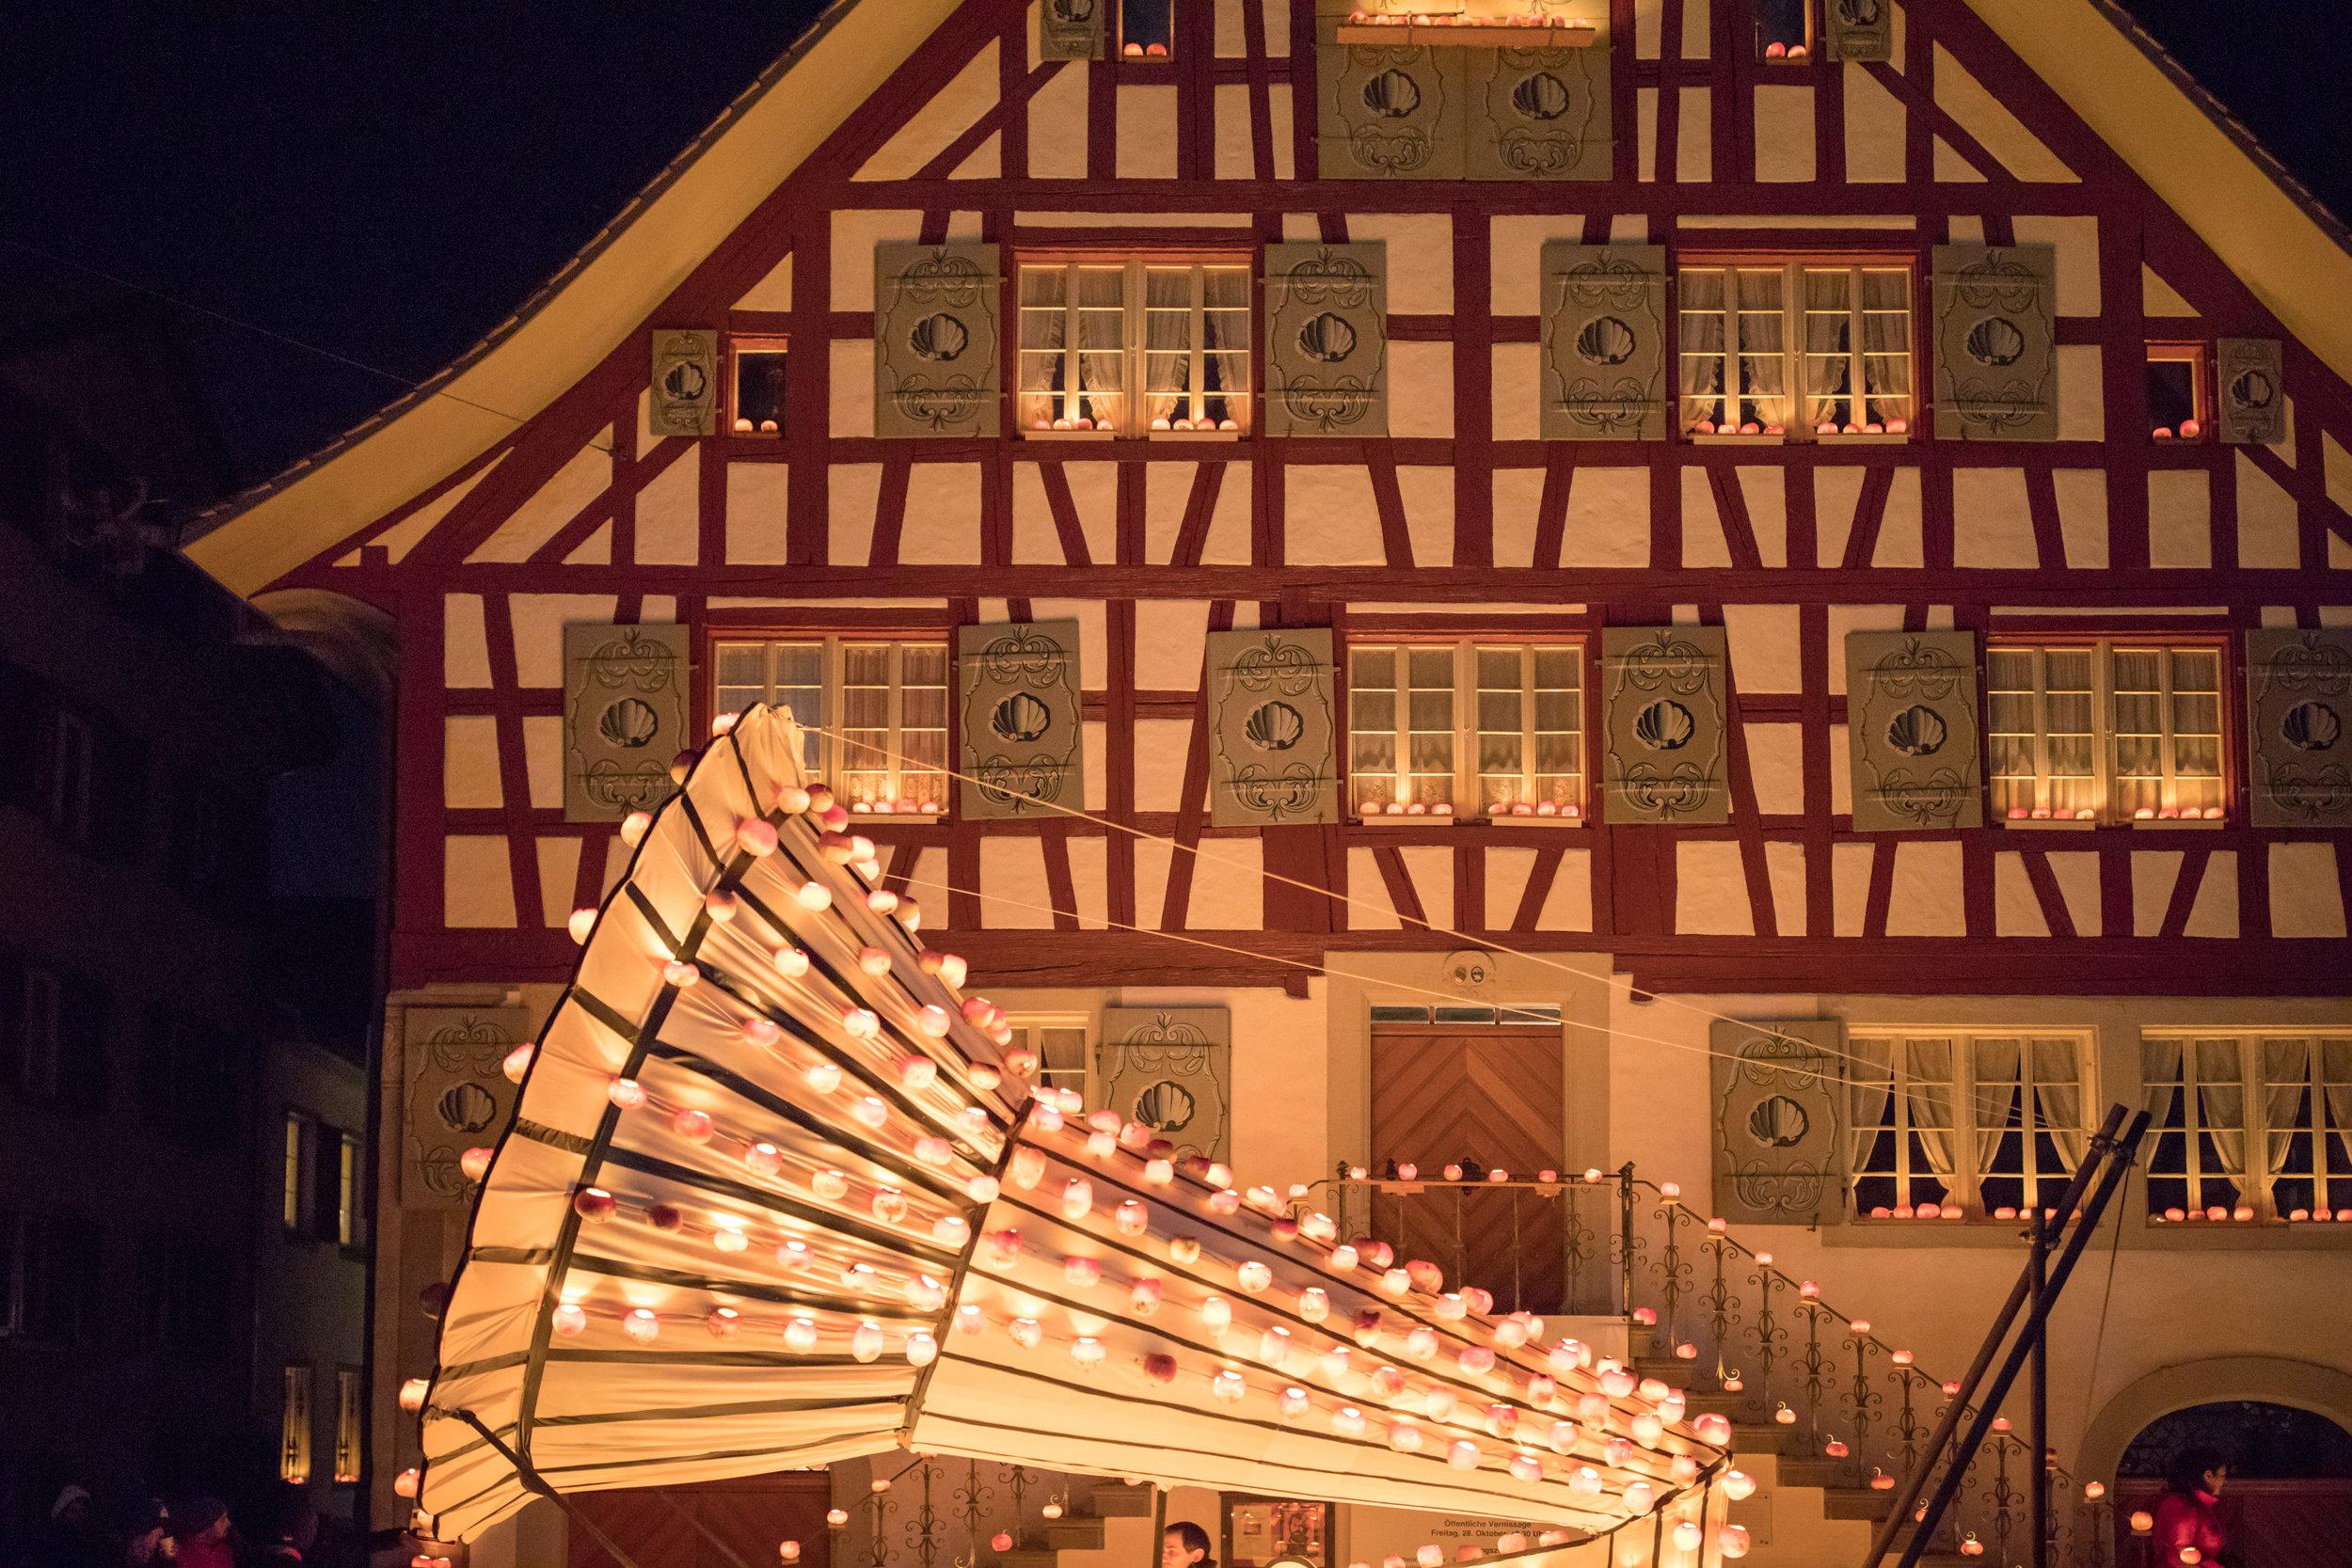 turnip-festival-parade-house-richterswil-switzerland.jpg